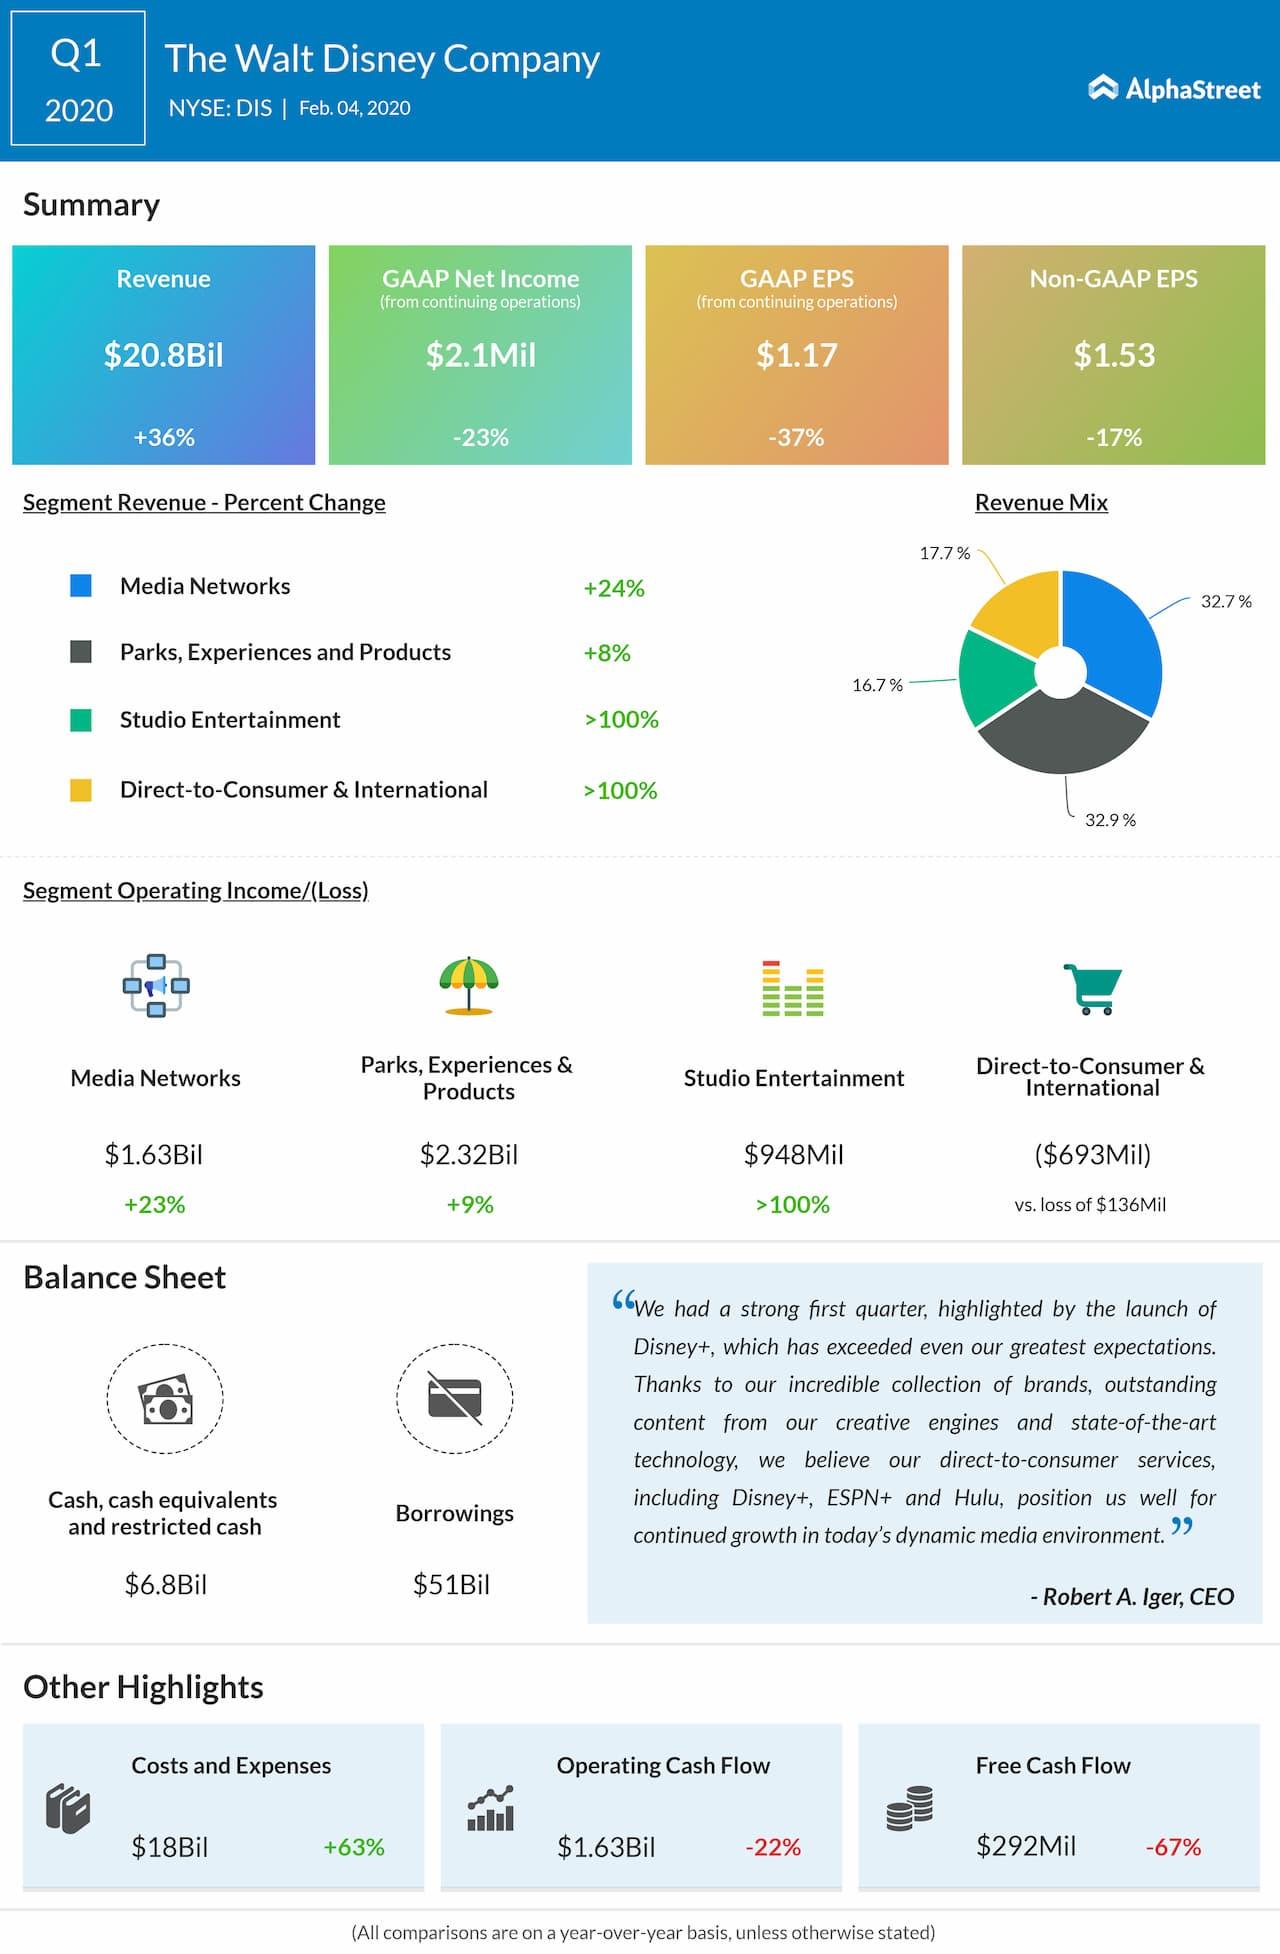 Walt Disney beat Q1 2020 revenue and earnings estimates